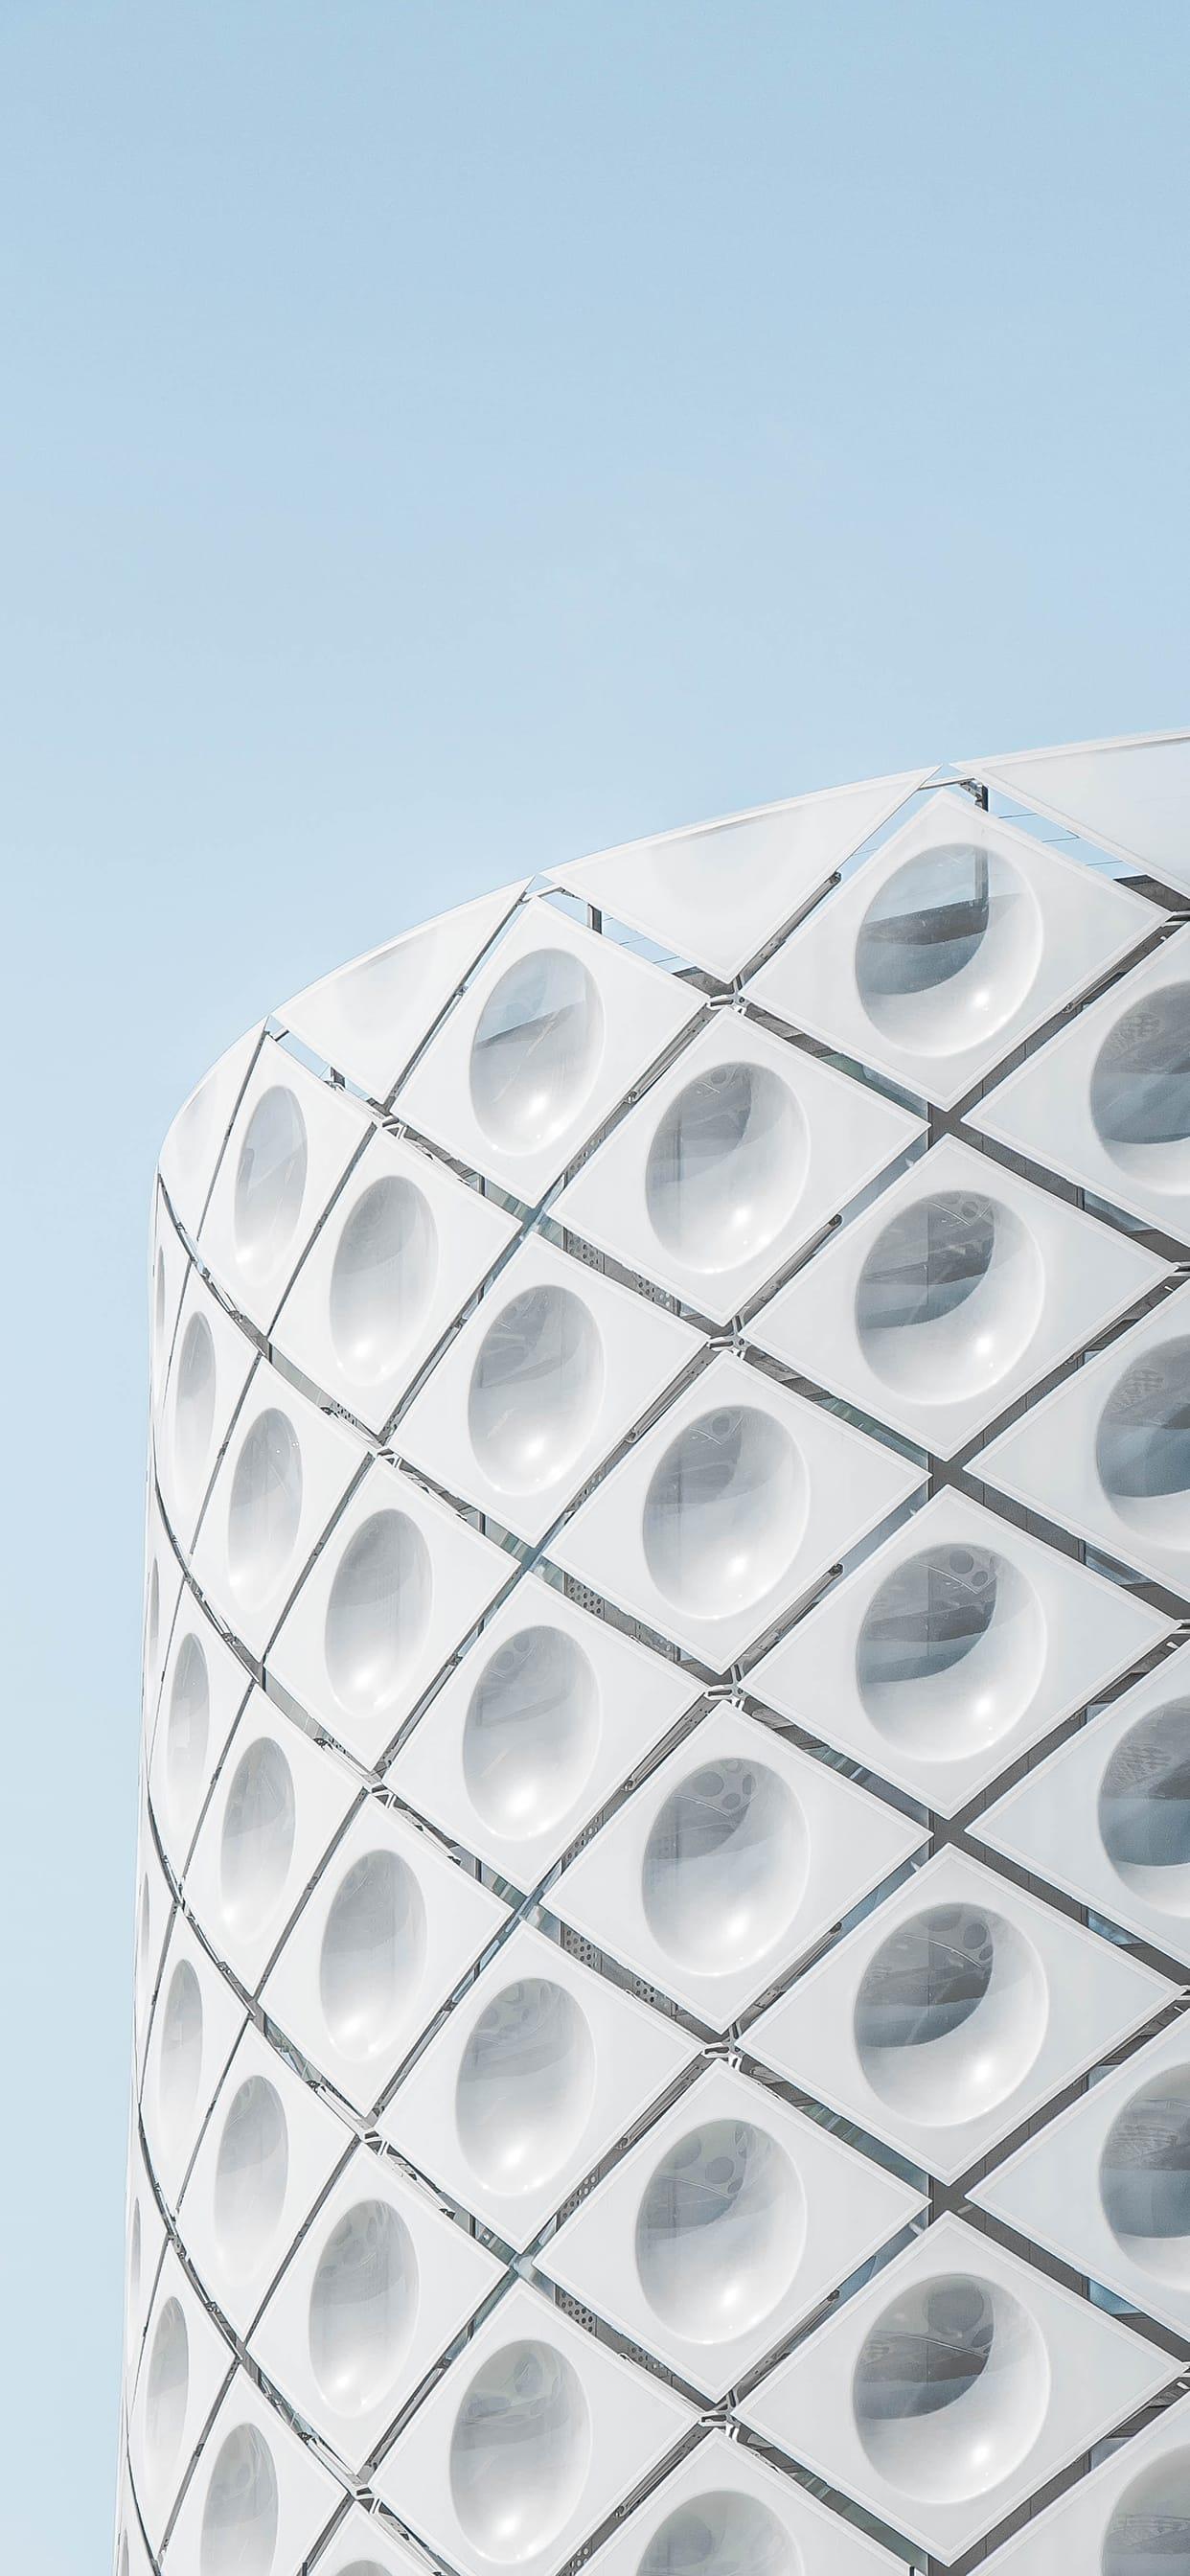 allapplenews-wallpaper-Architecture